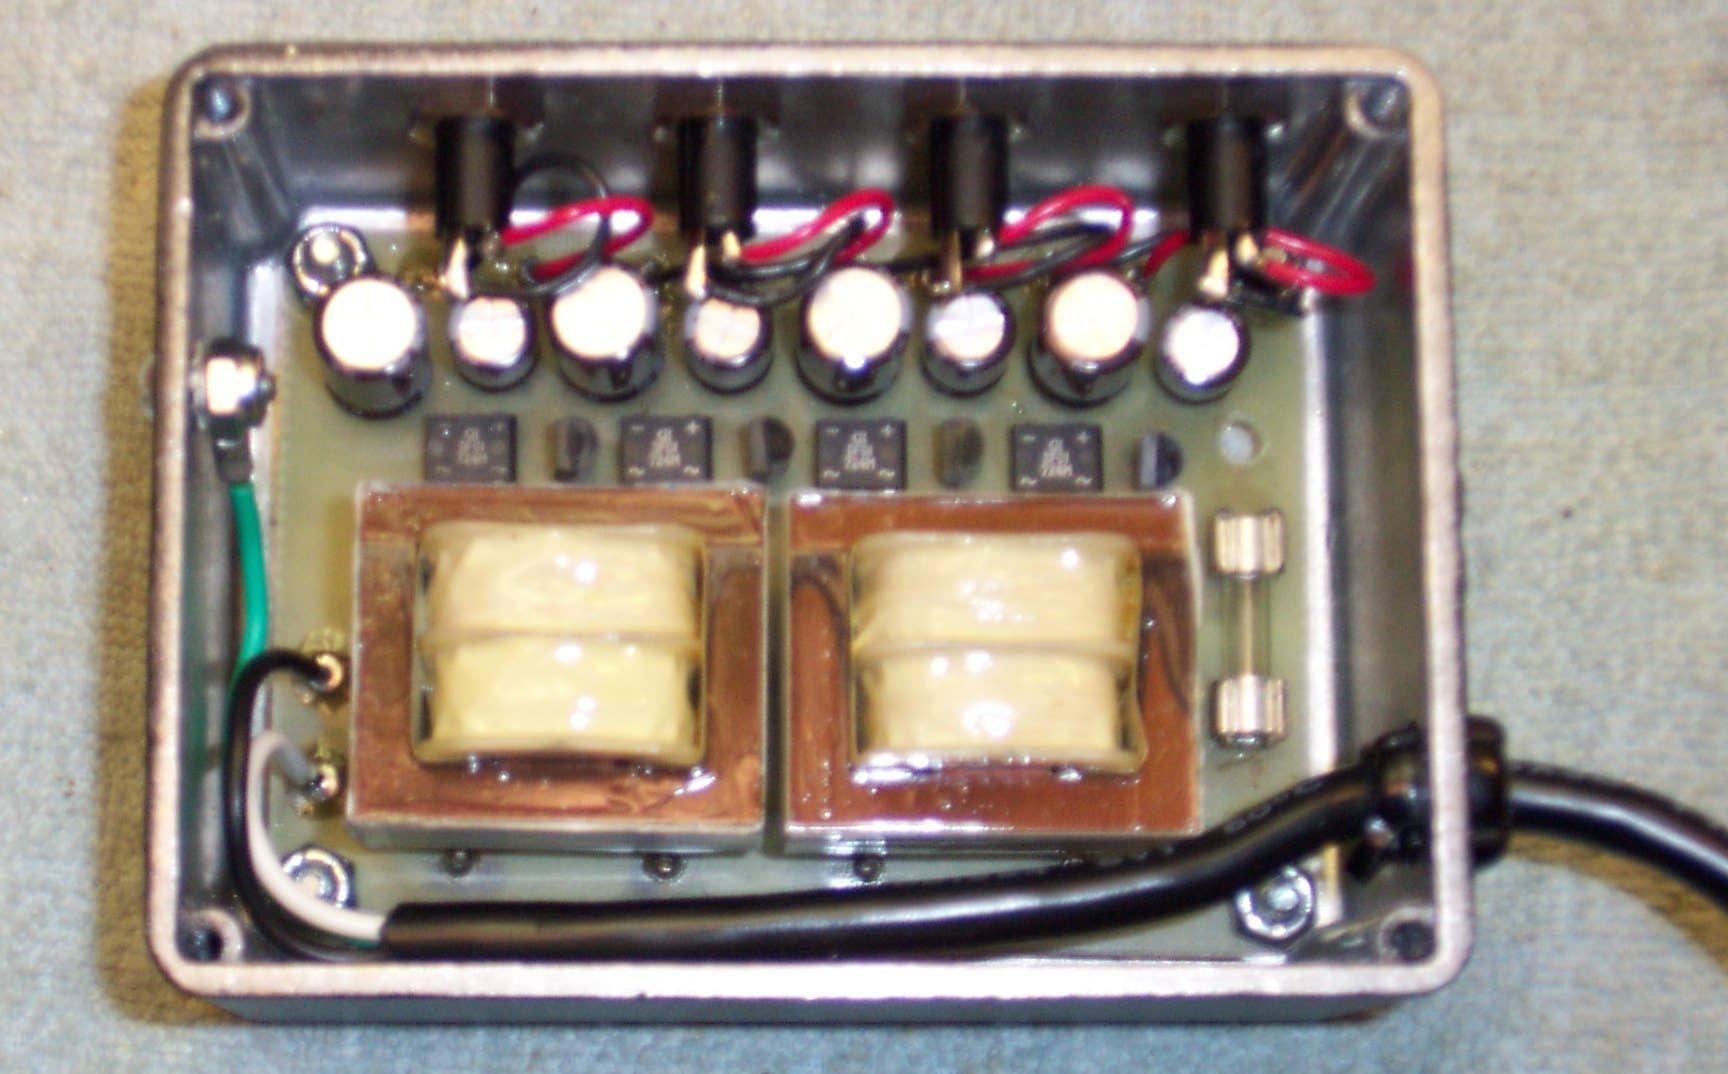 hight resolution of ss ps4 power supply inside